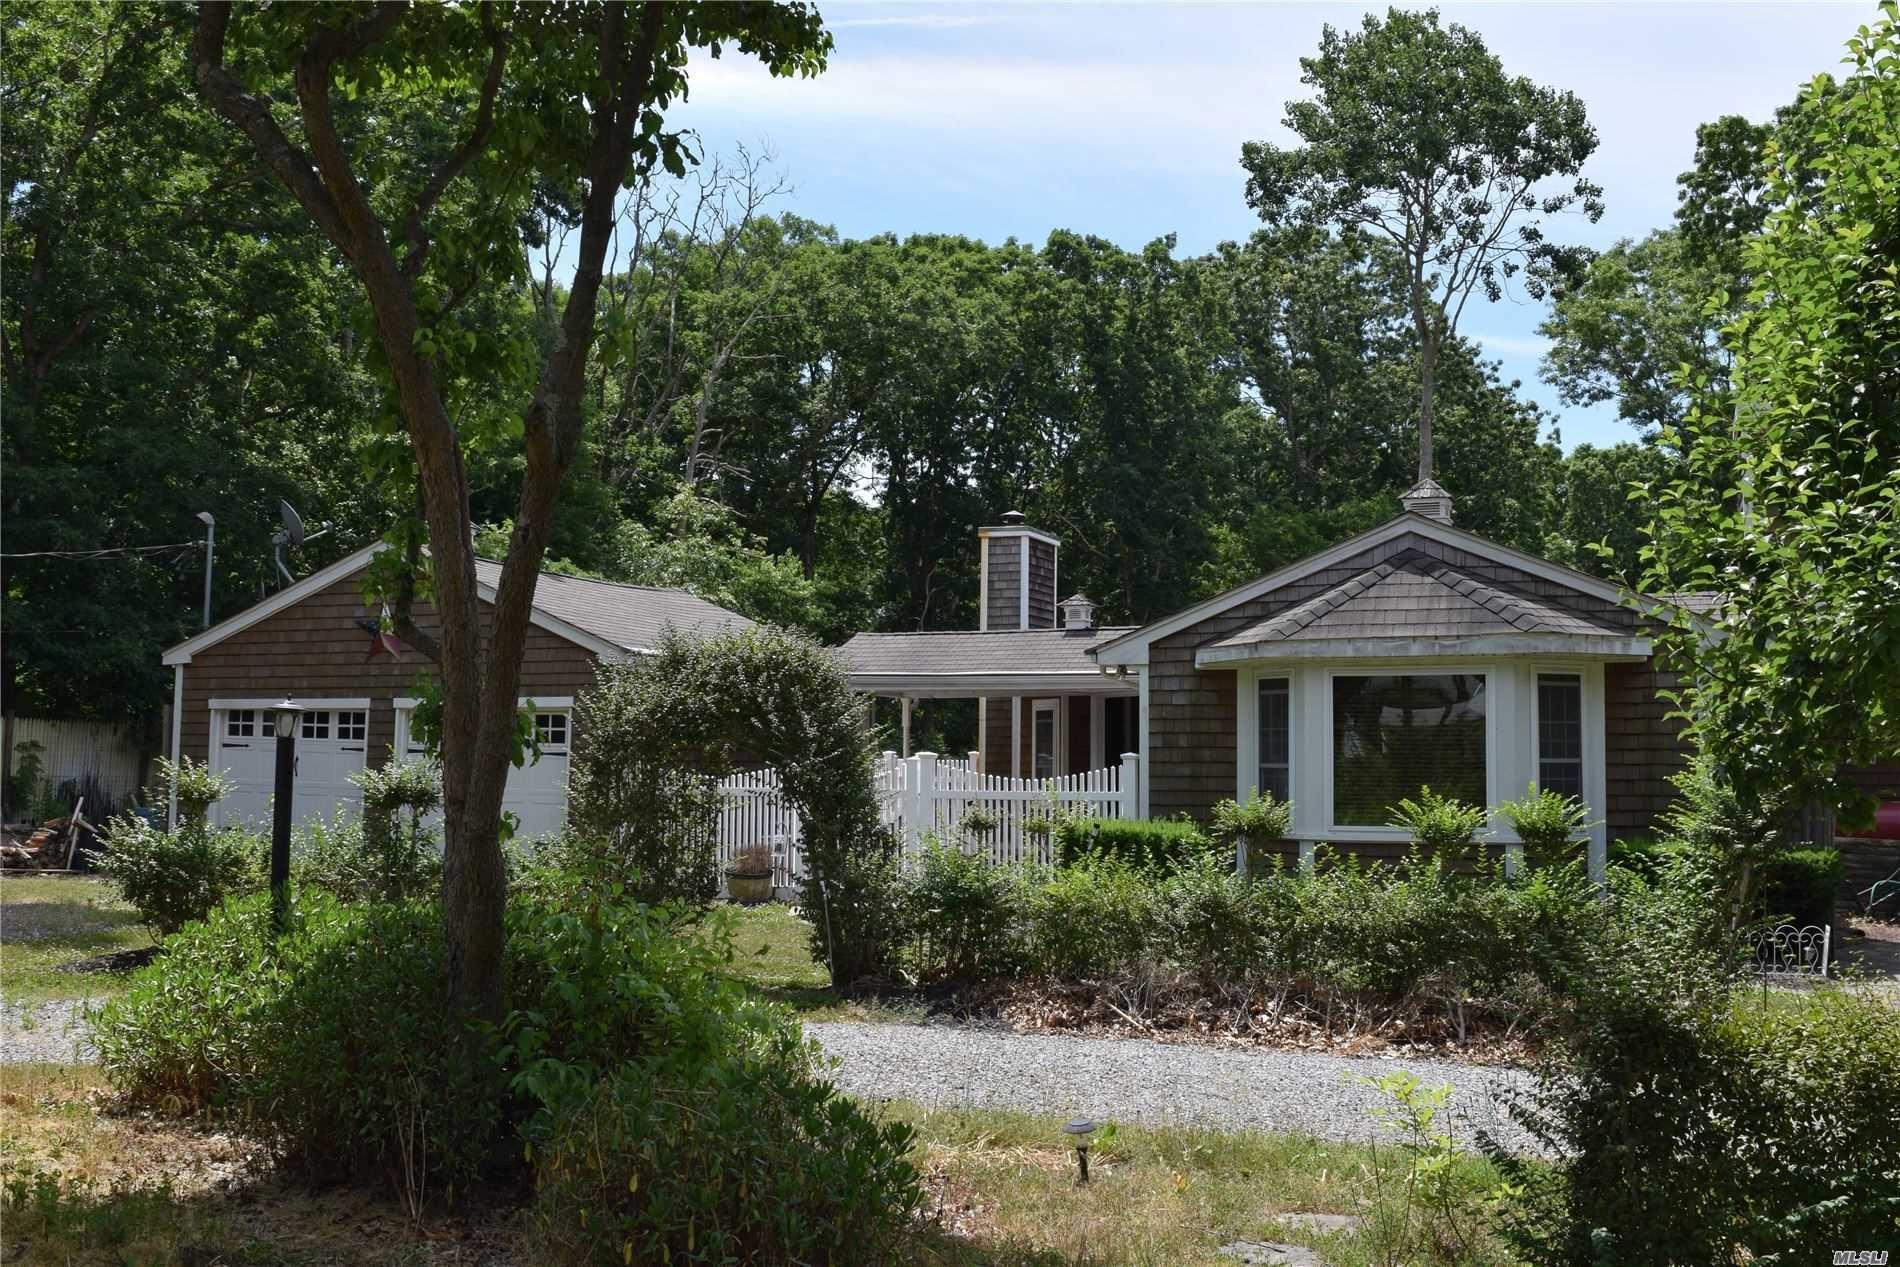 14 Elizabeth Way, Ridge, NY 11961 - MLS#: 3211180